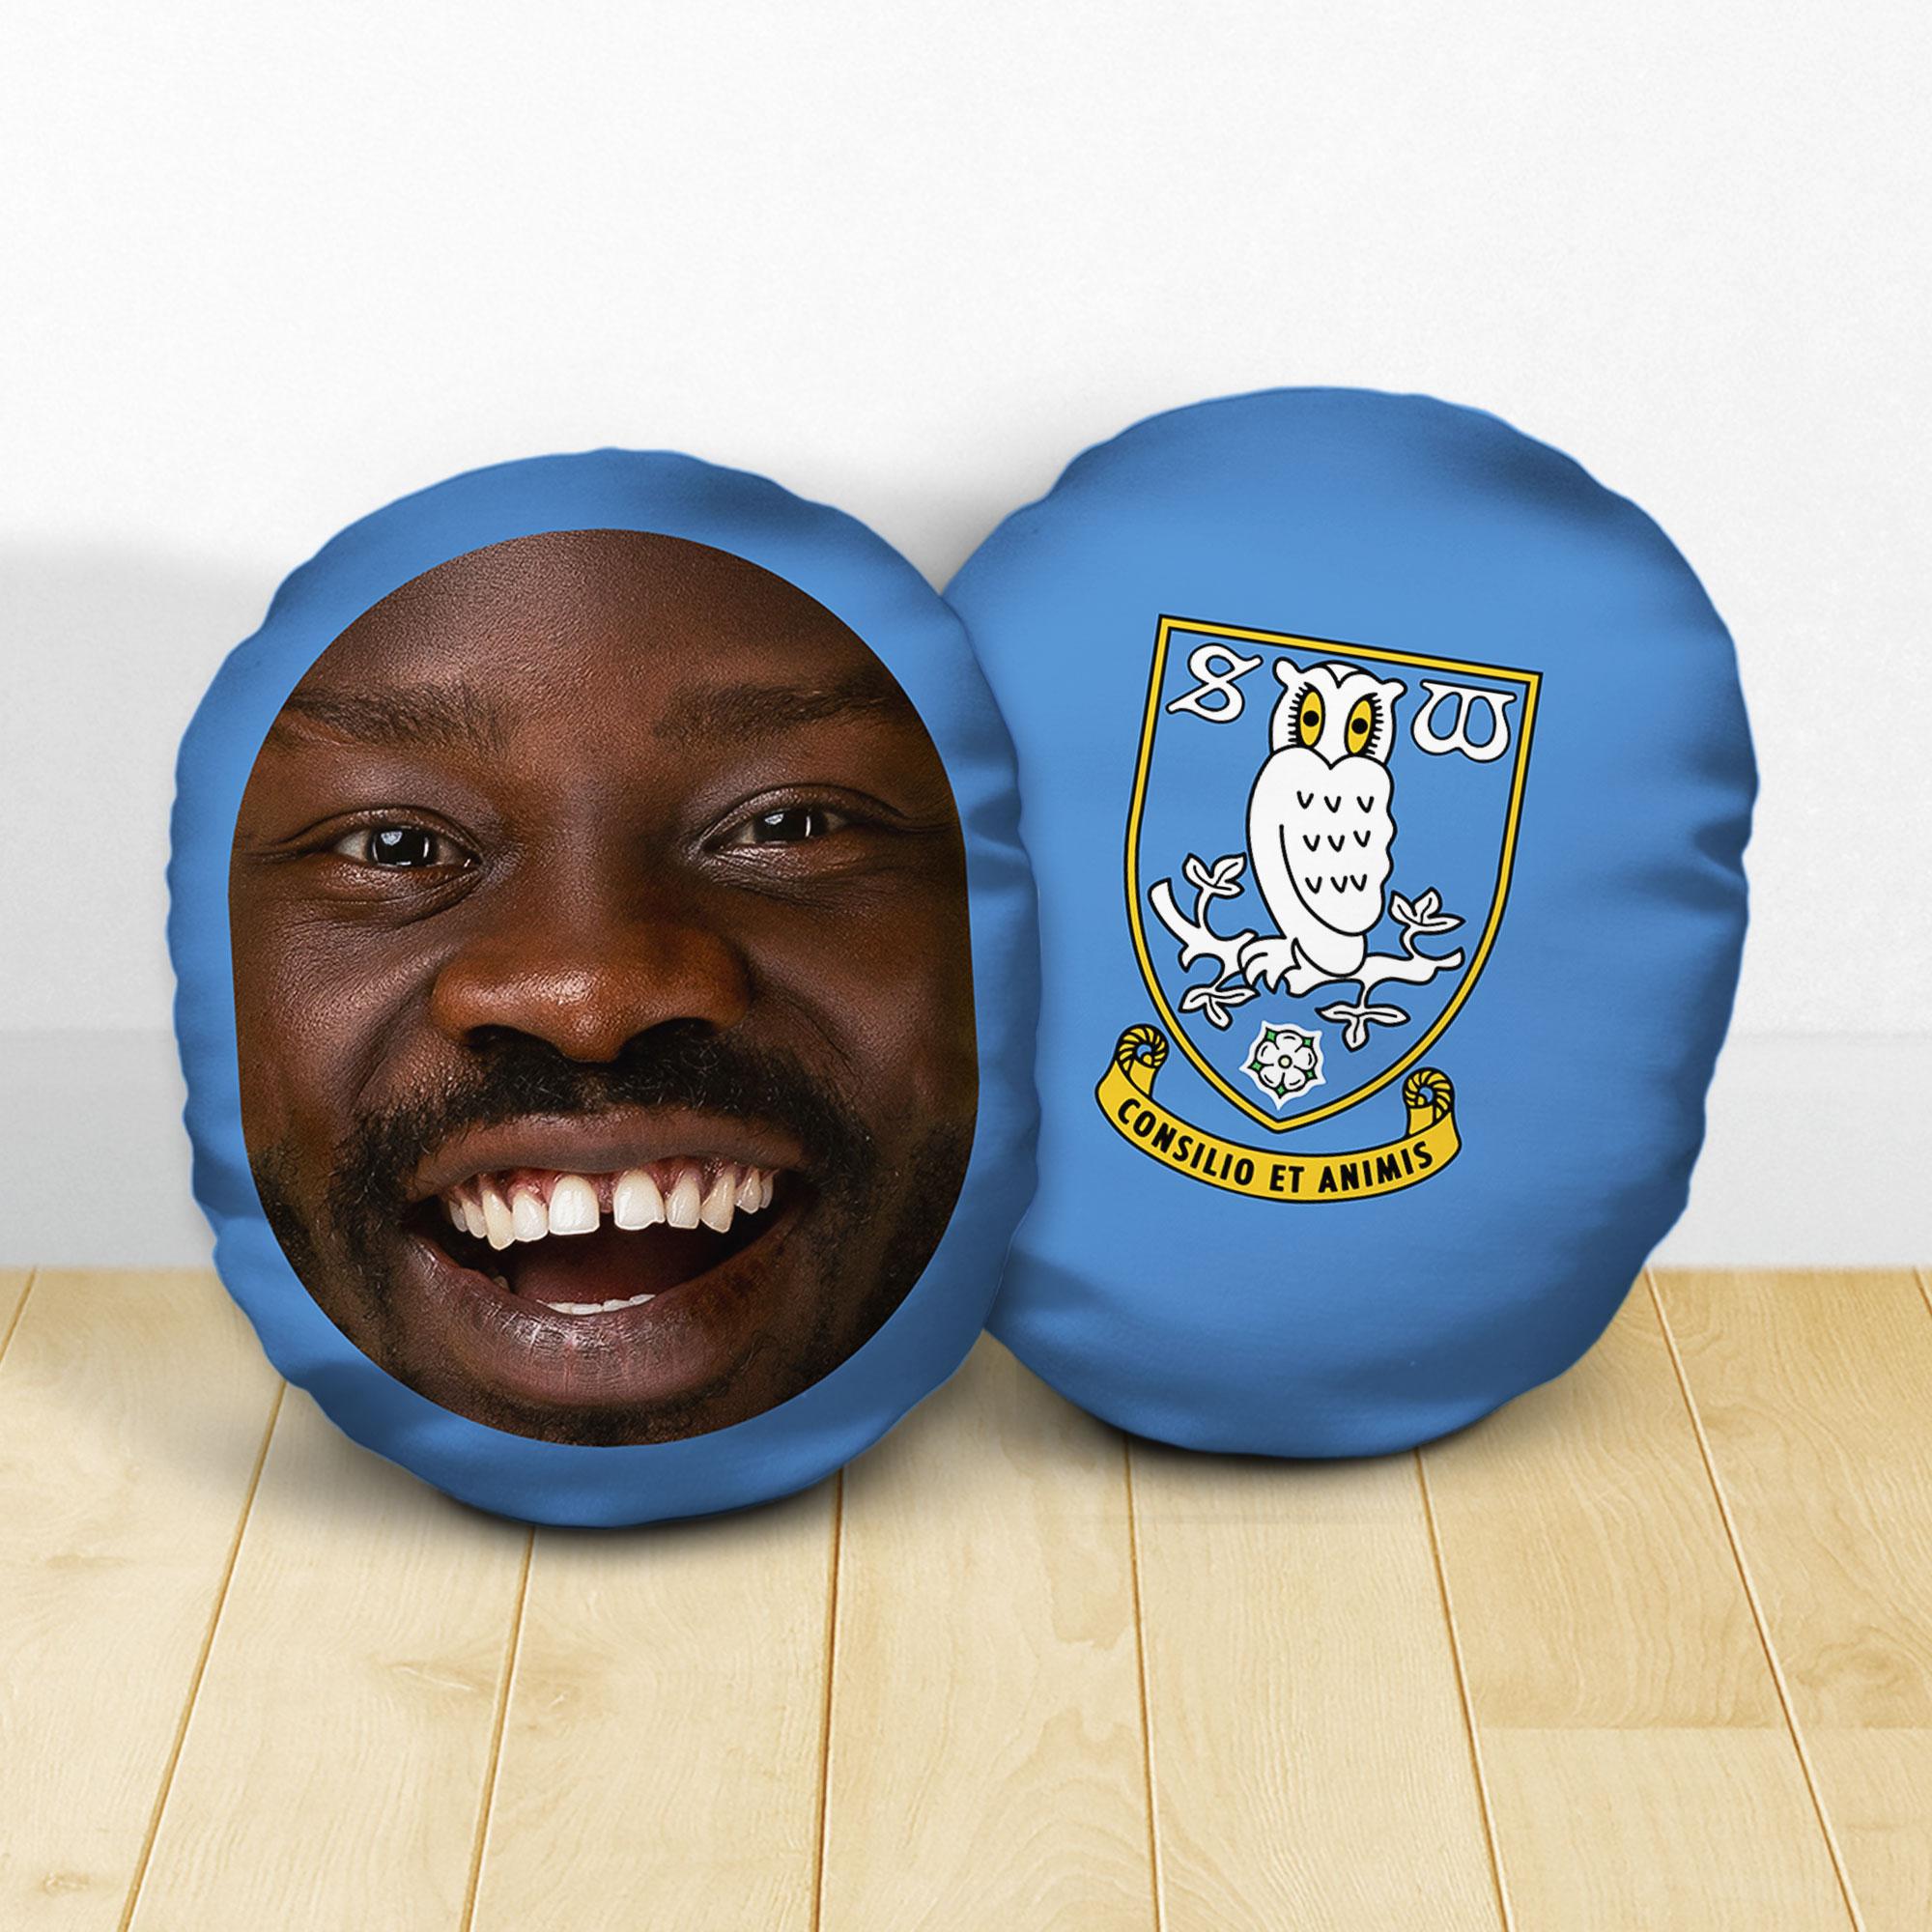 Personalised Sheffield Wednesday FC Crest Mush Cush